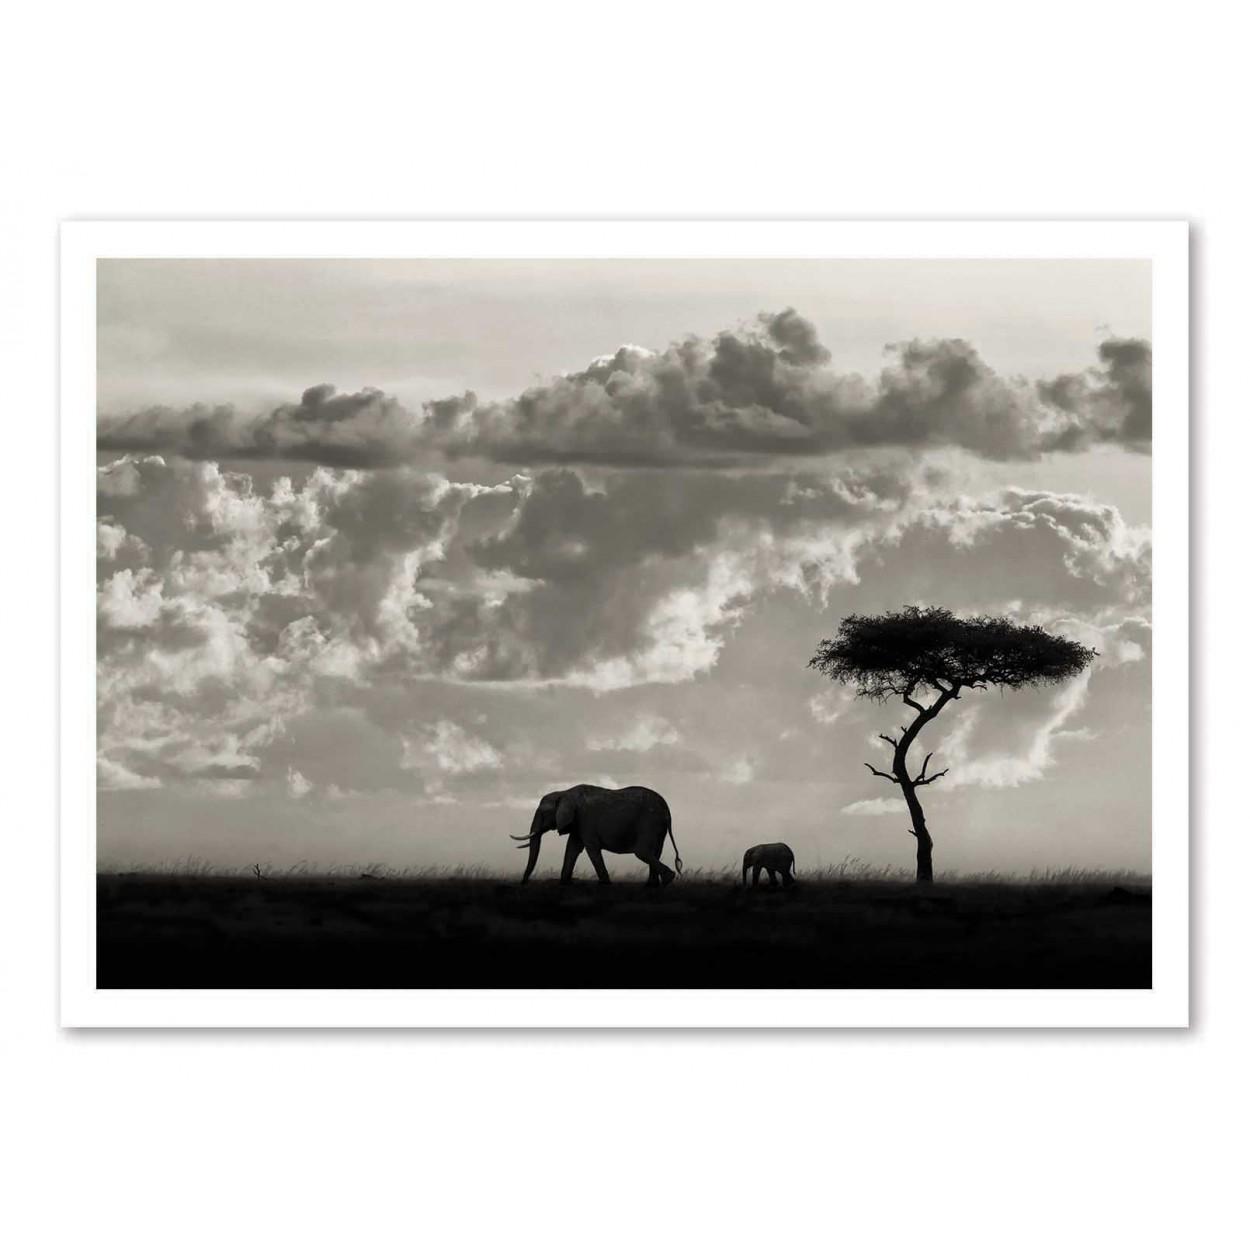 SILHOUETTE OF AN ELEPHANT - Affiche d'art 50 x 70 cm